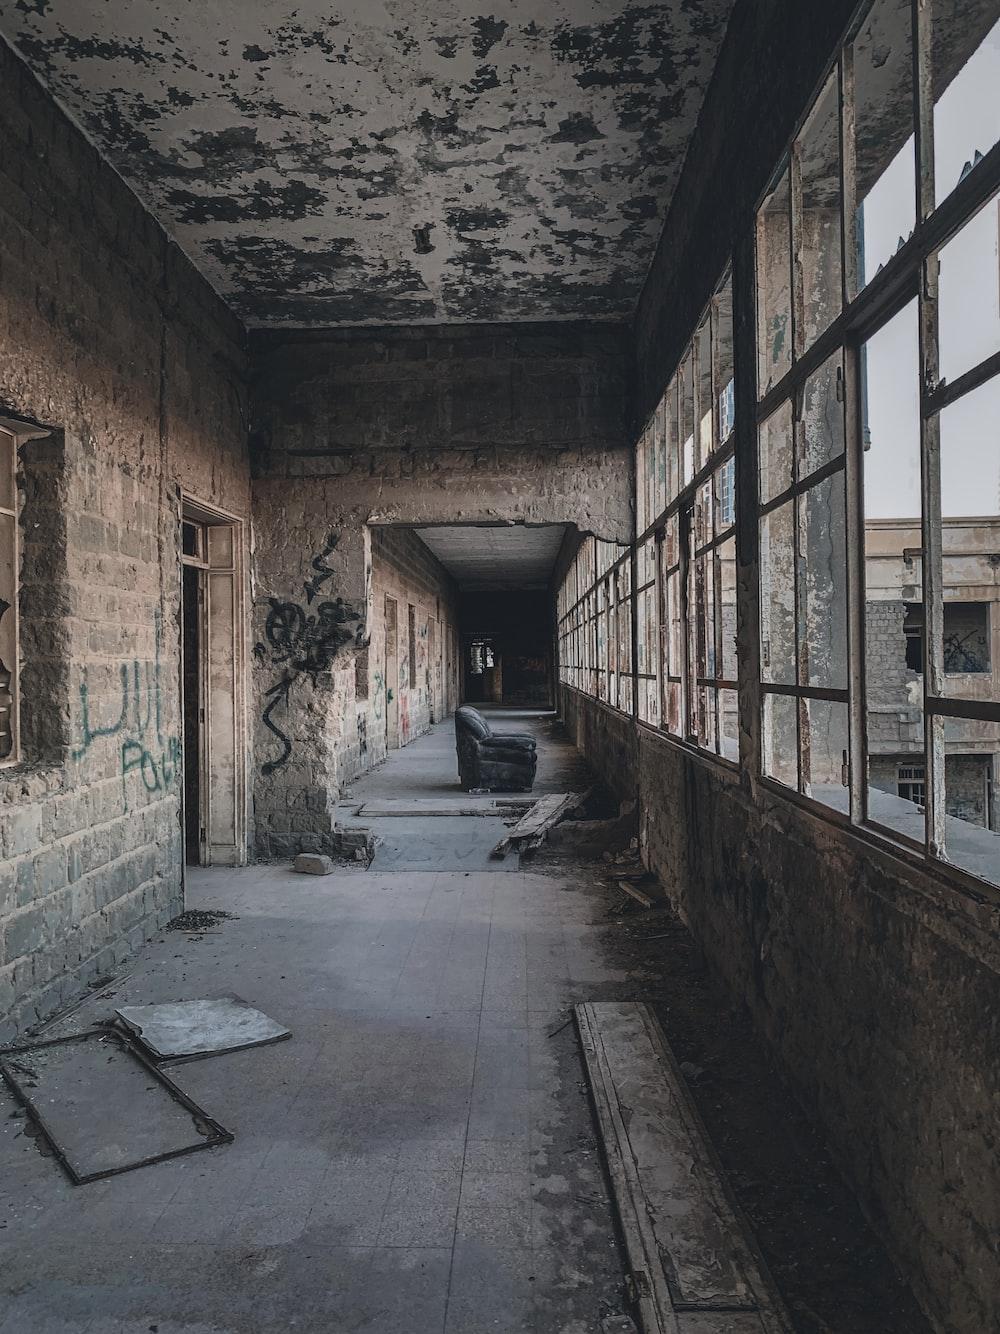 empty hallway with brown brick walls